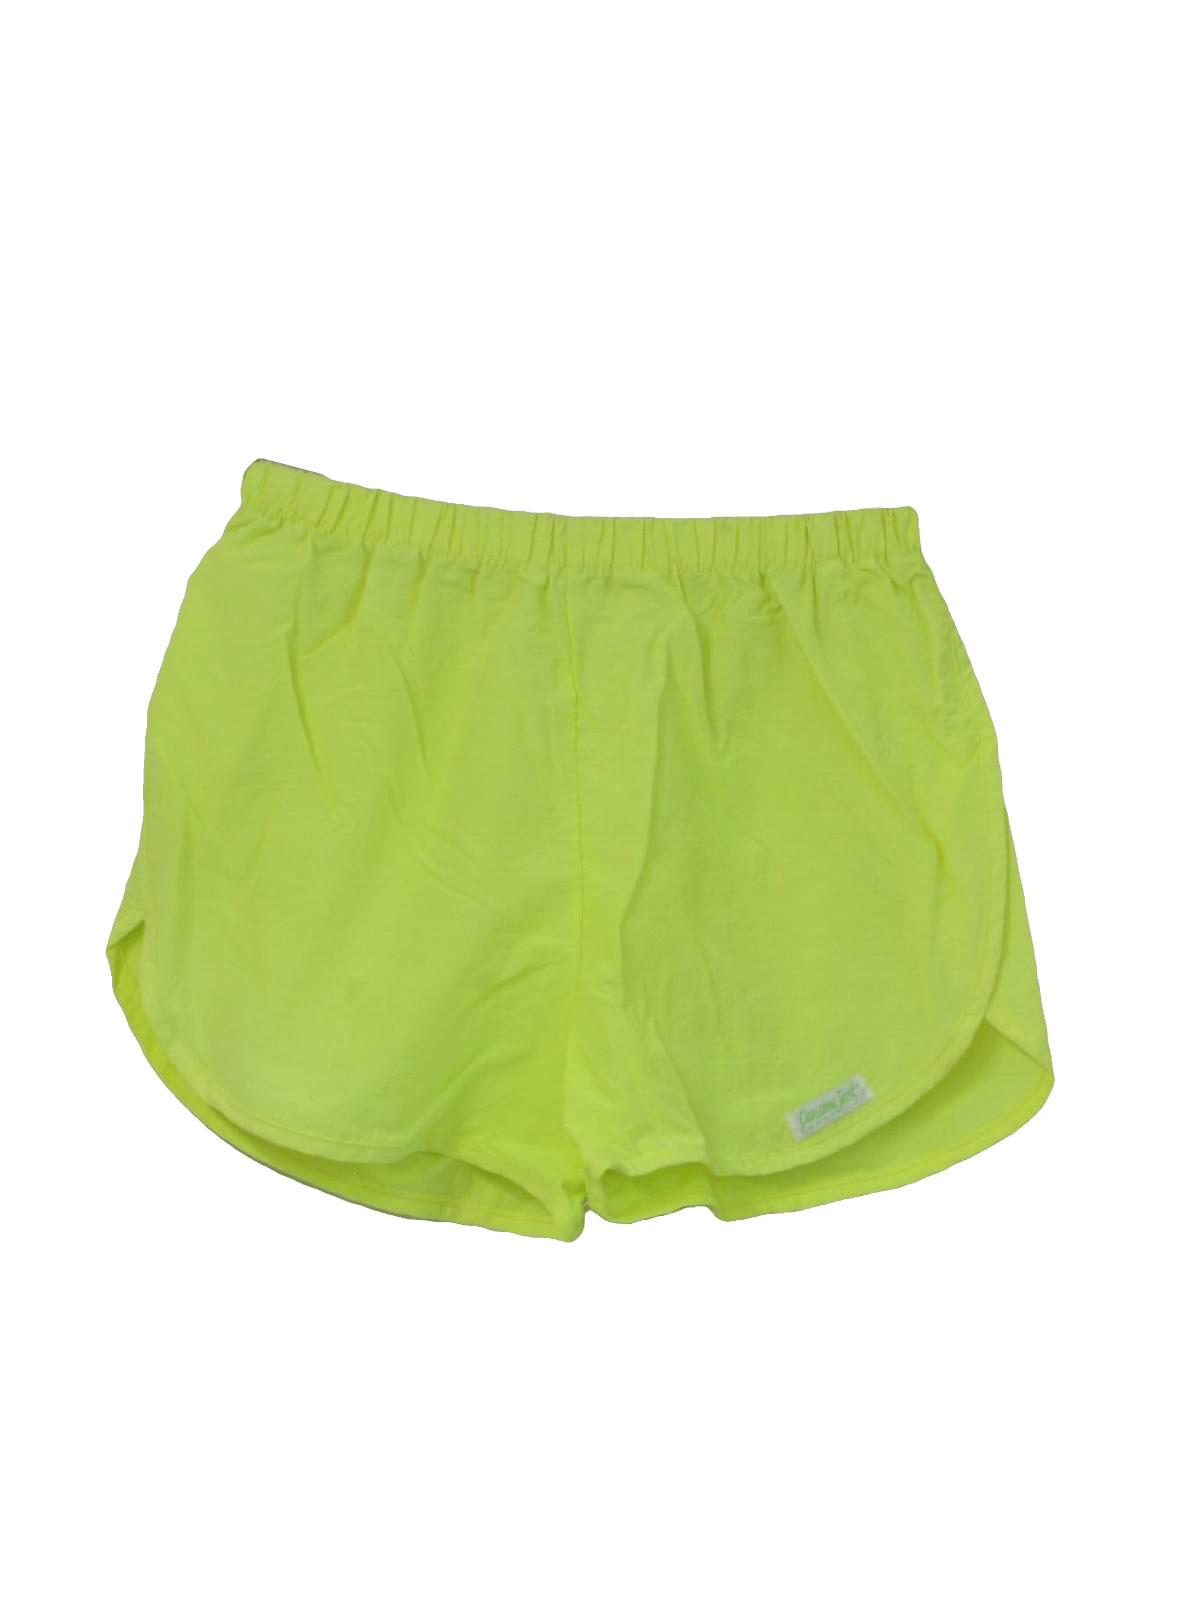 Retro 1980's Shorts (Panama Jack) : 80s -Panama Jack- Mens neon ...